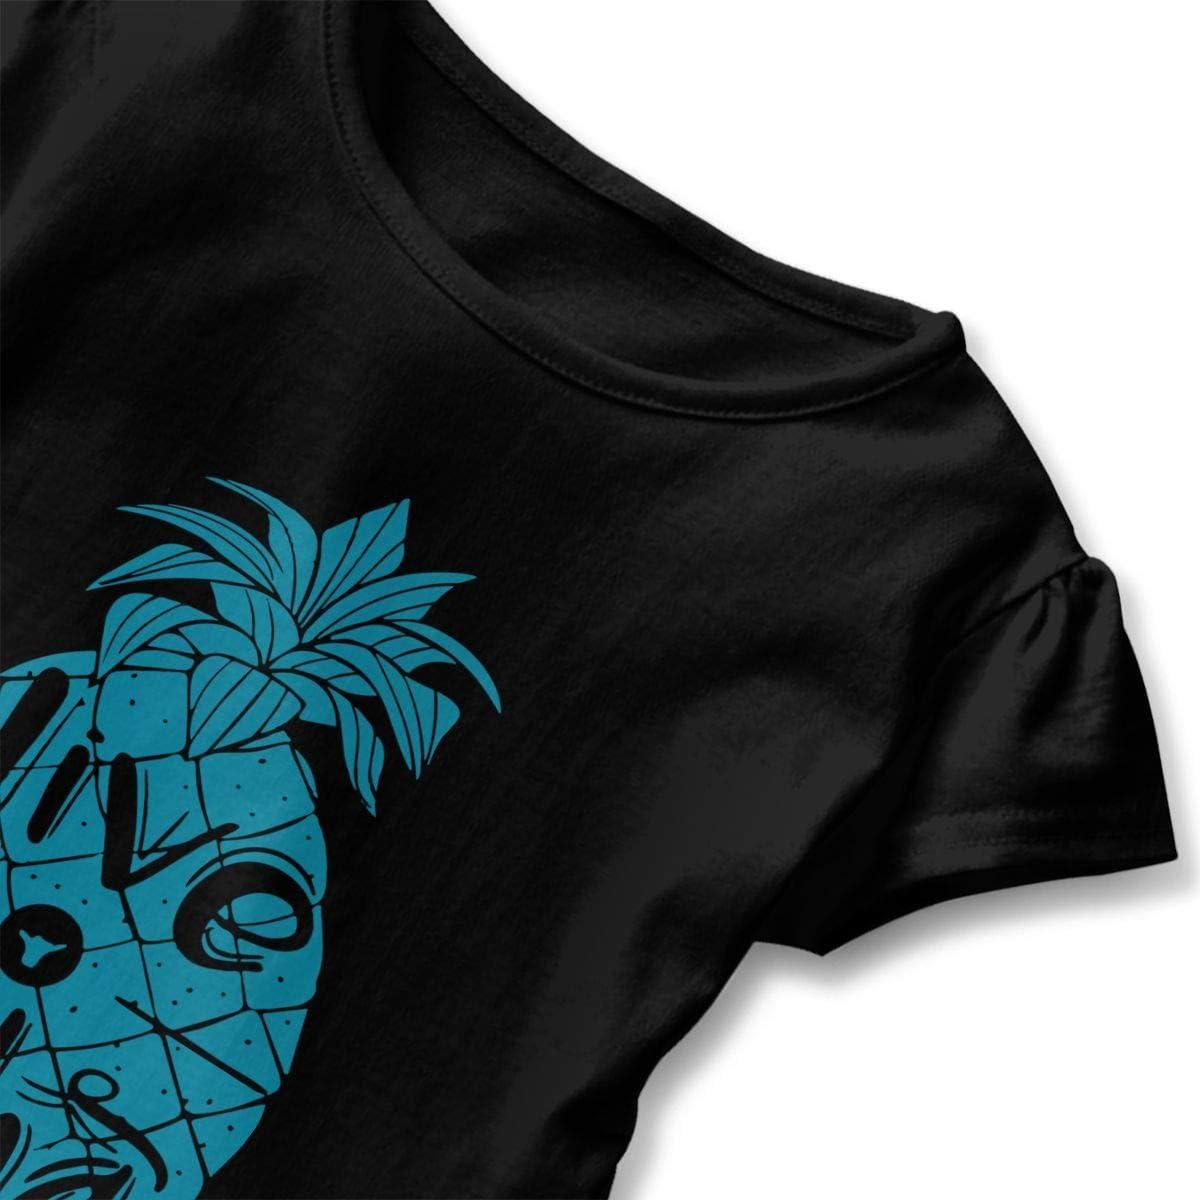 Fashion Tunic Shirt Dress with Falbala Short Sleeve Live Aloha Pineapple Shirts for Kids 2-6T